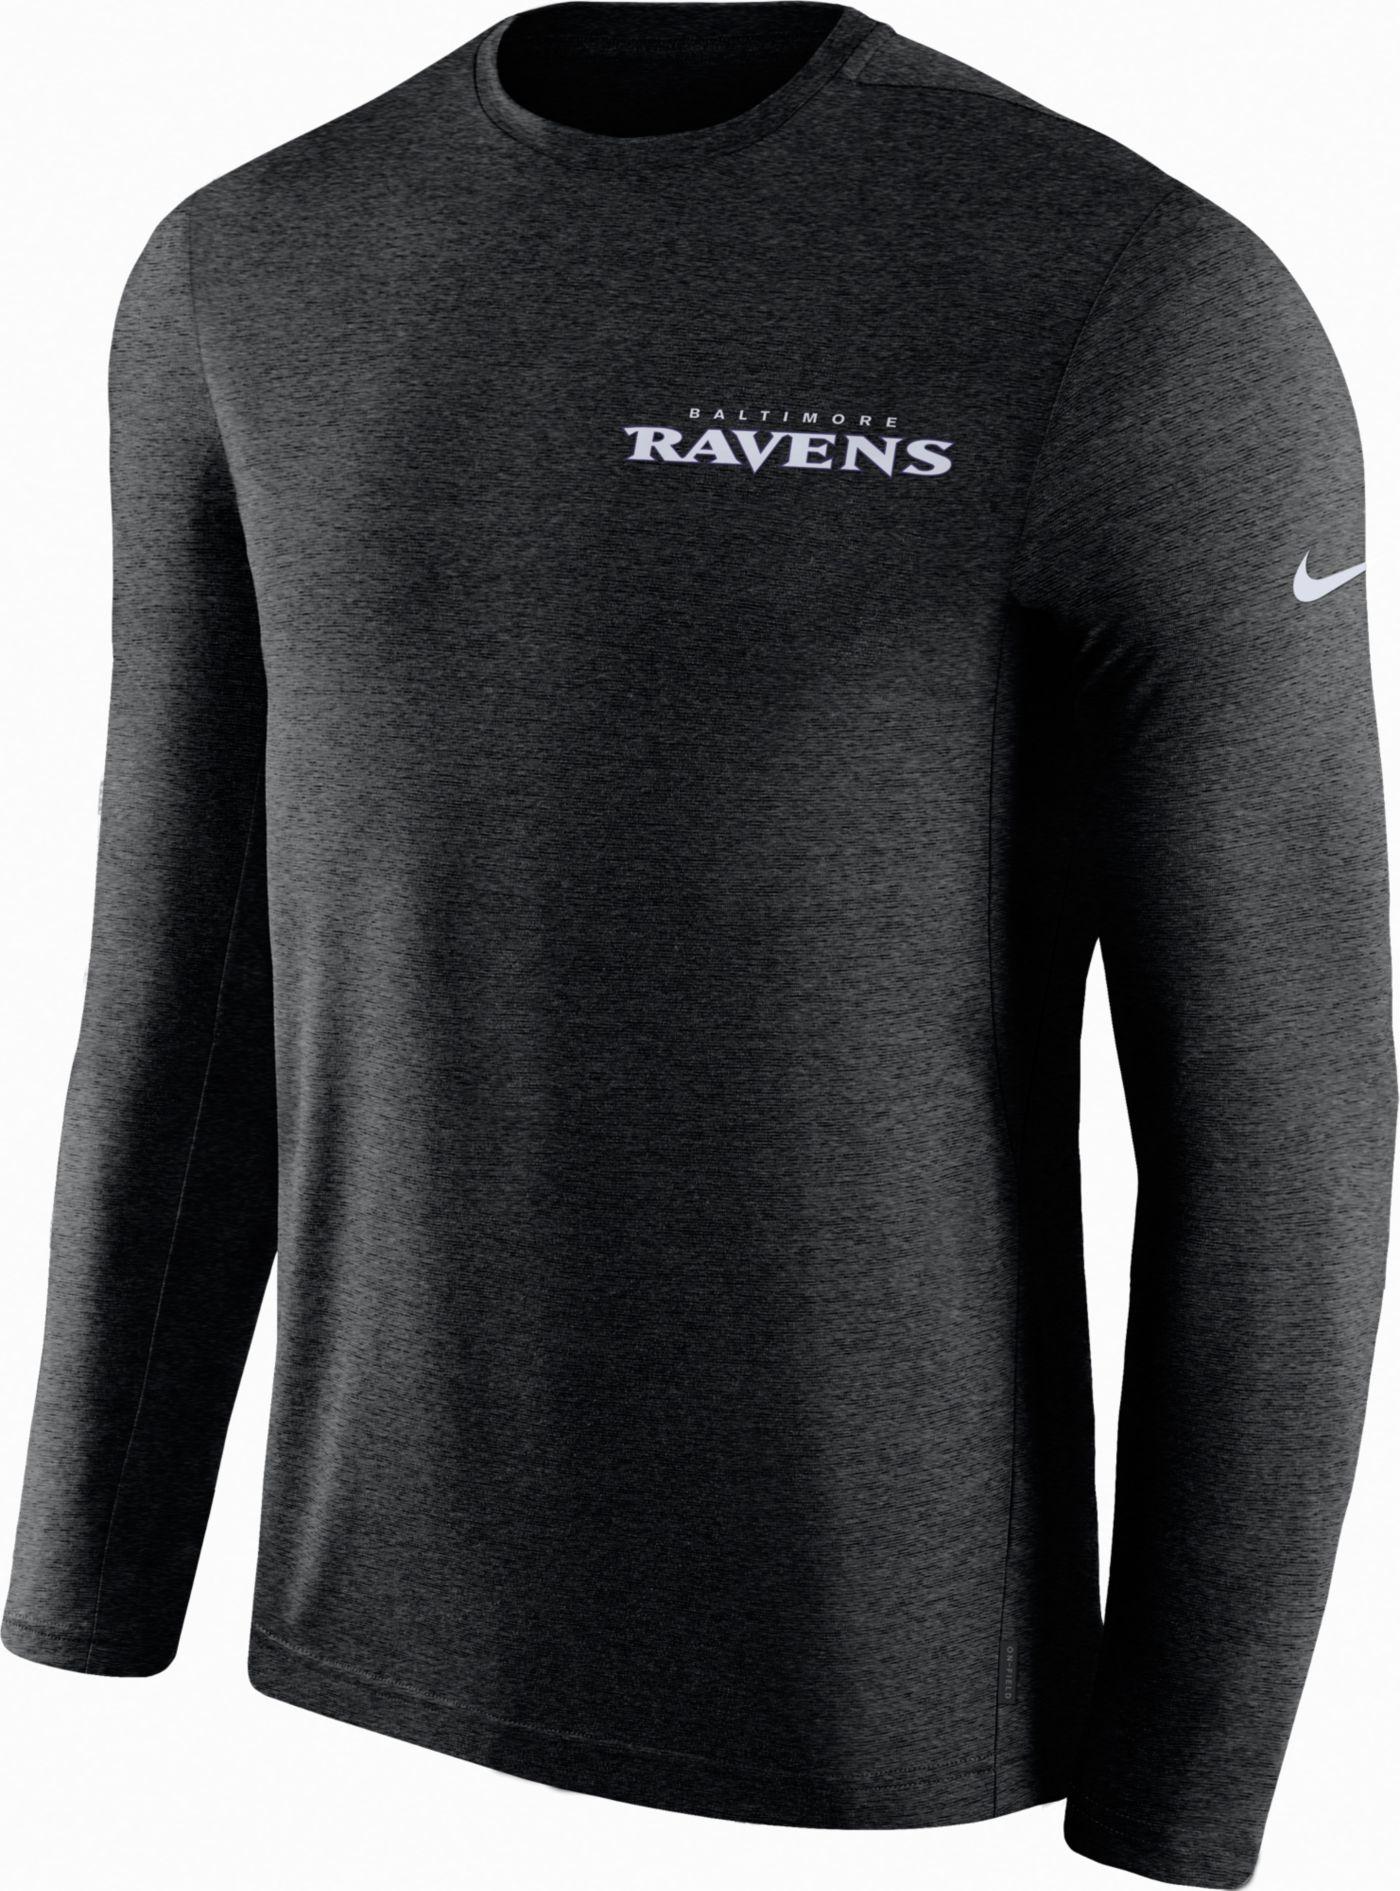 Nike Men's Baltimore Ravens Sideline Coach Performance Black Long Sleeve Shirt